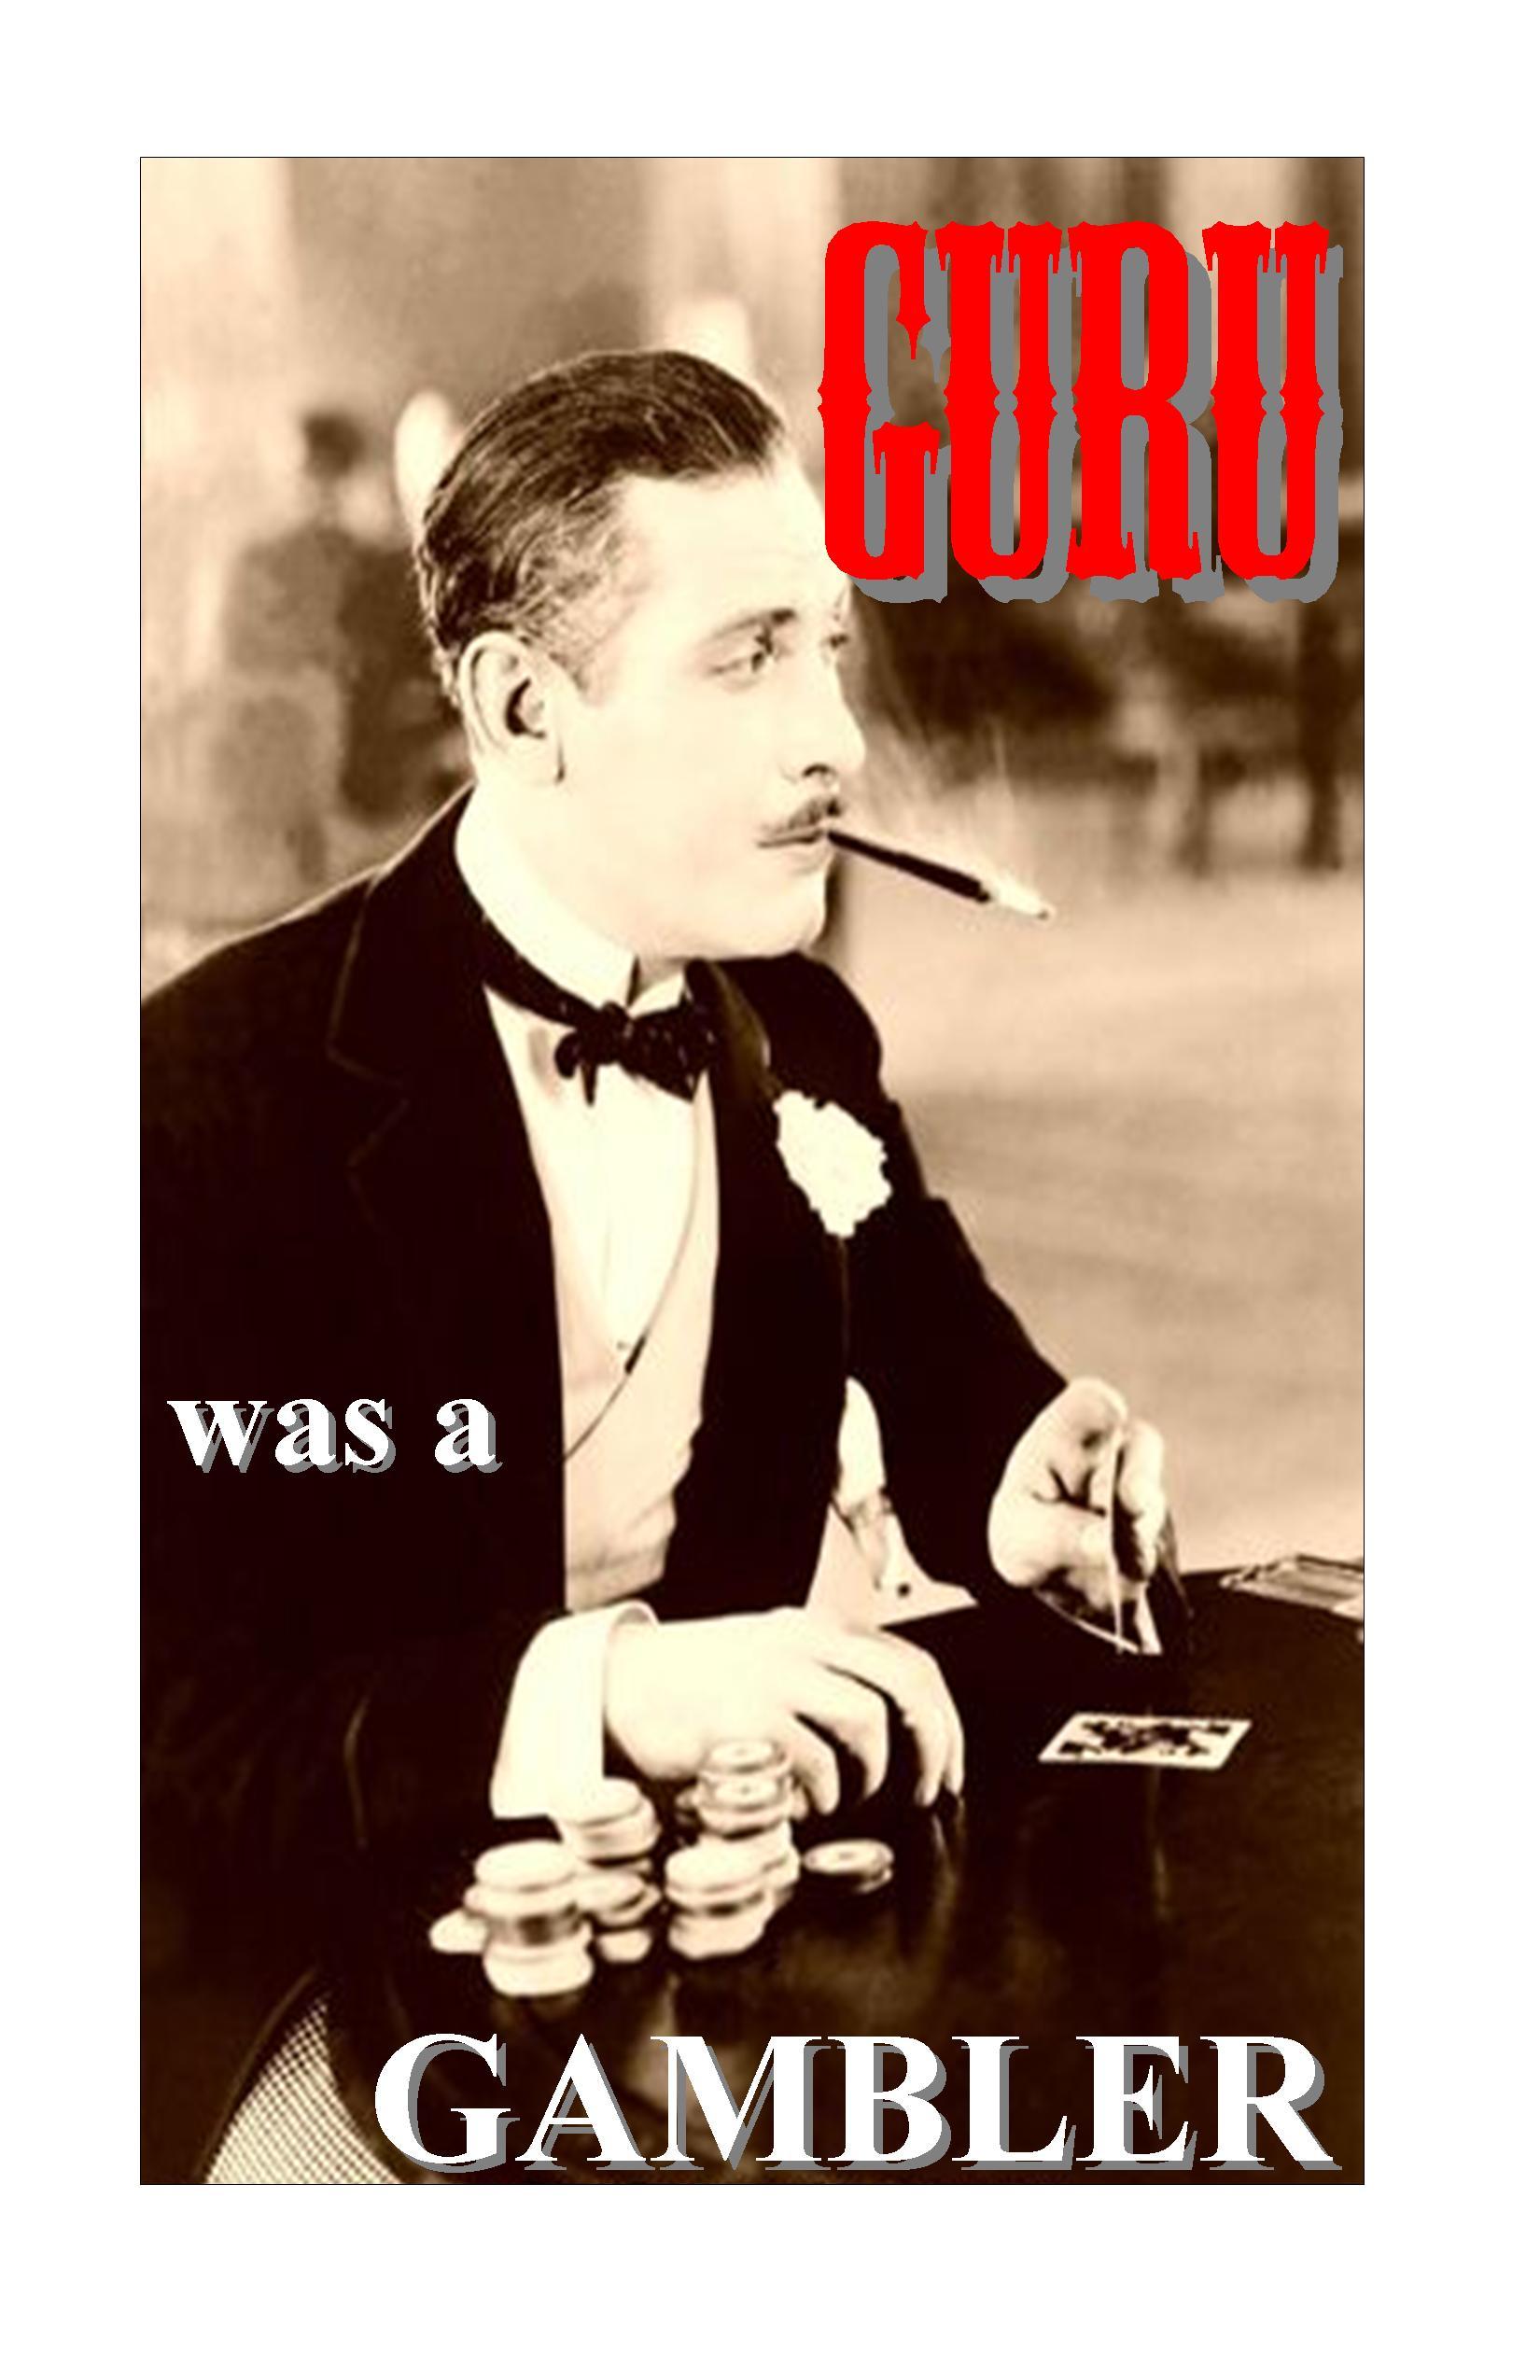 GURU WAS A GAMBLER